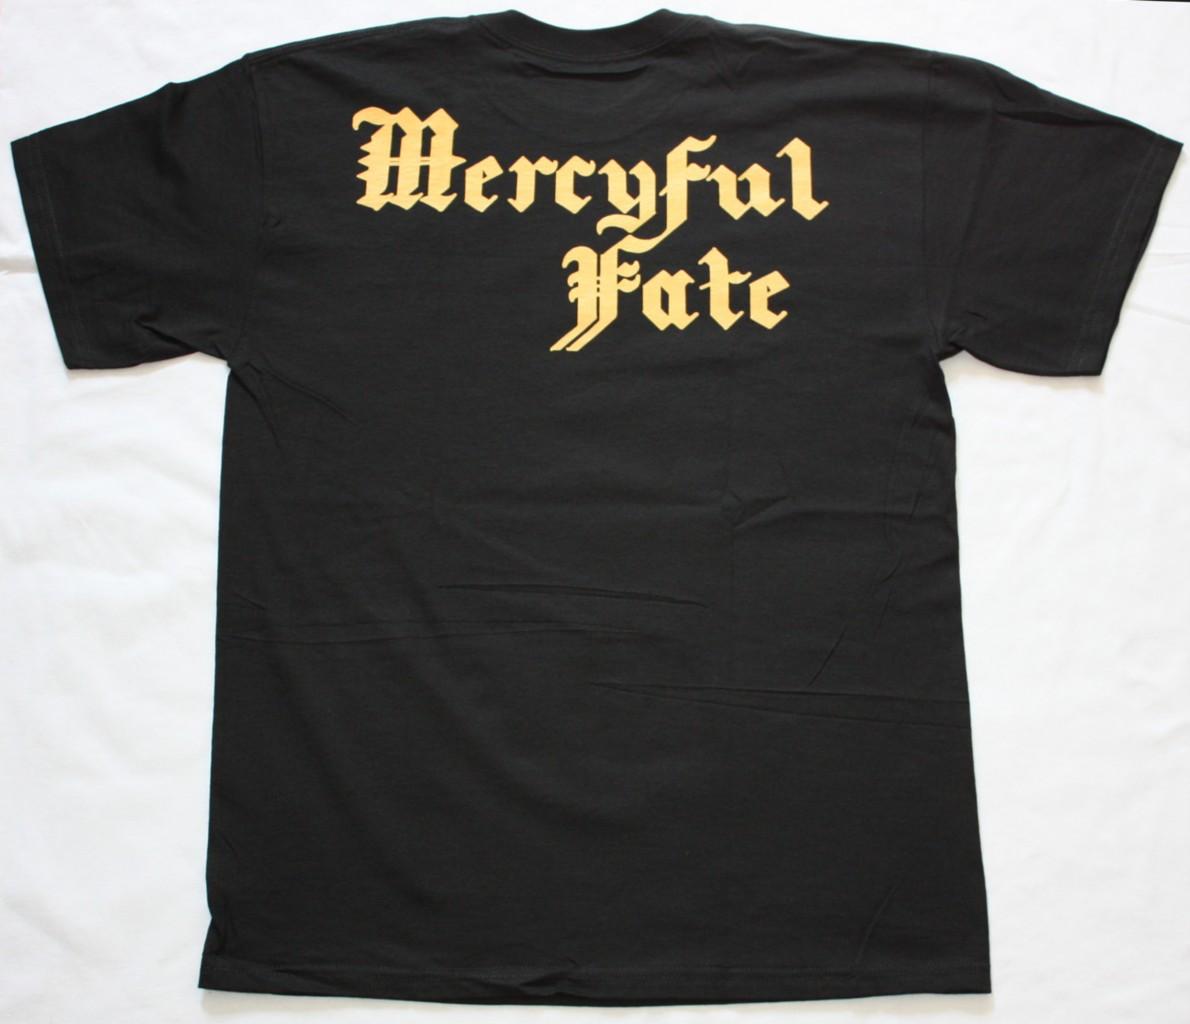 MERCYFUL FATE MELISSA'83 NEW BLACK T-SHIRT